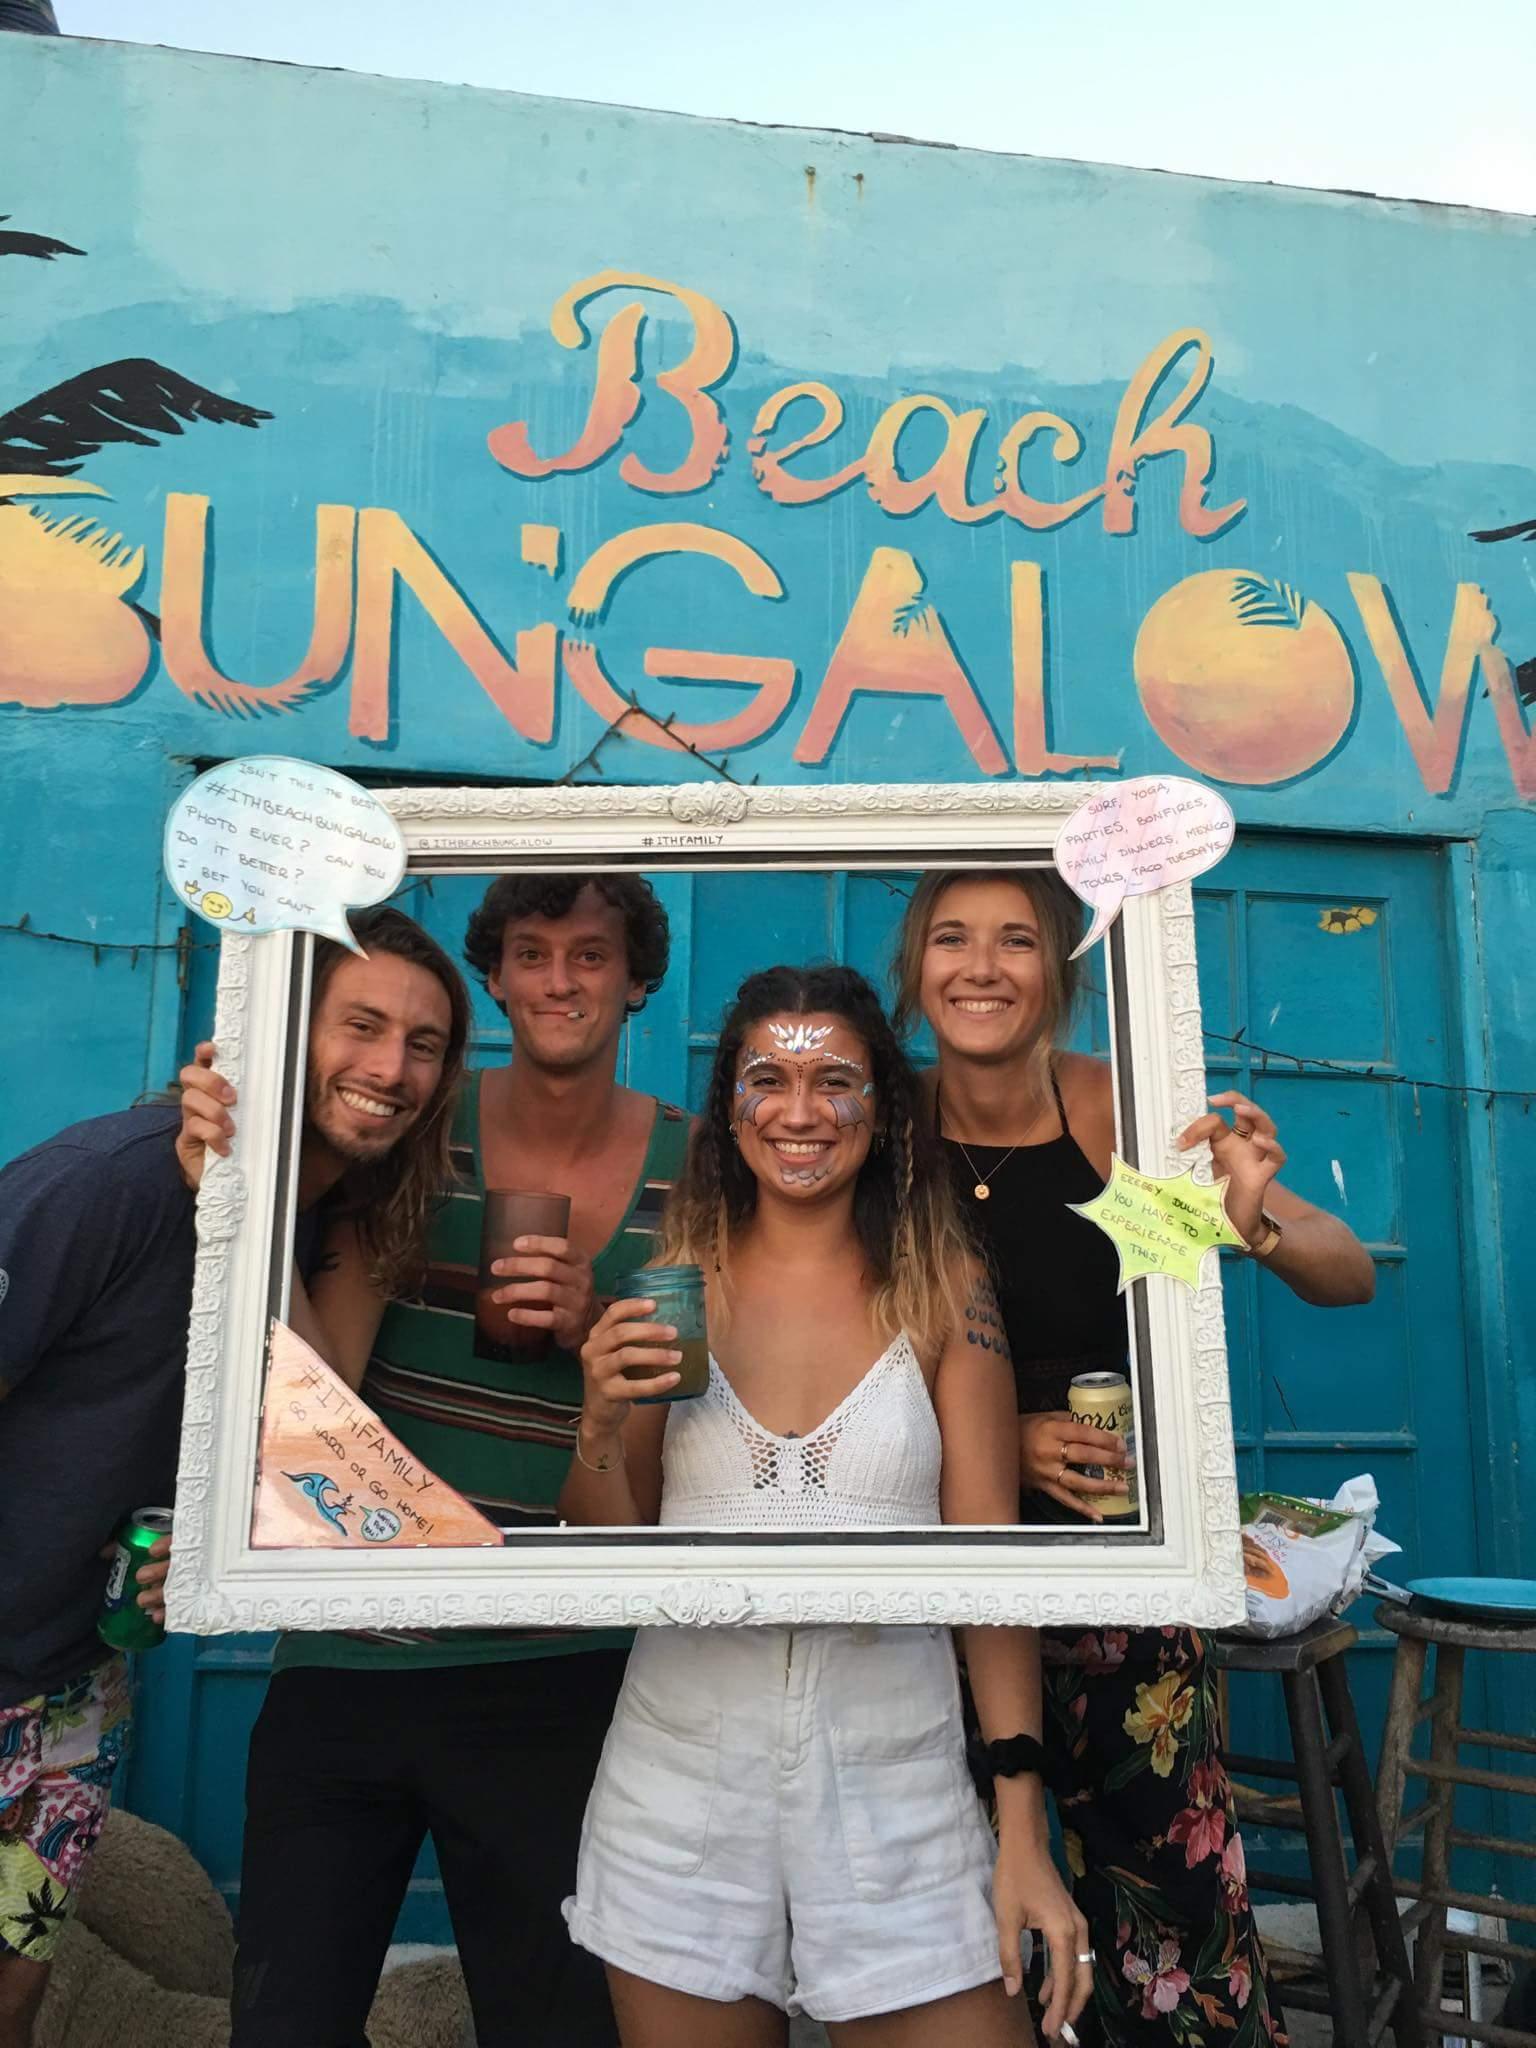 HOSTEL - ITH Beach Bungalow Surf Hostel